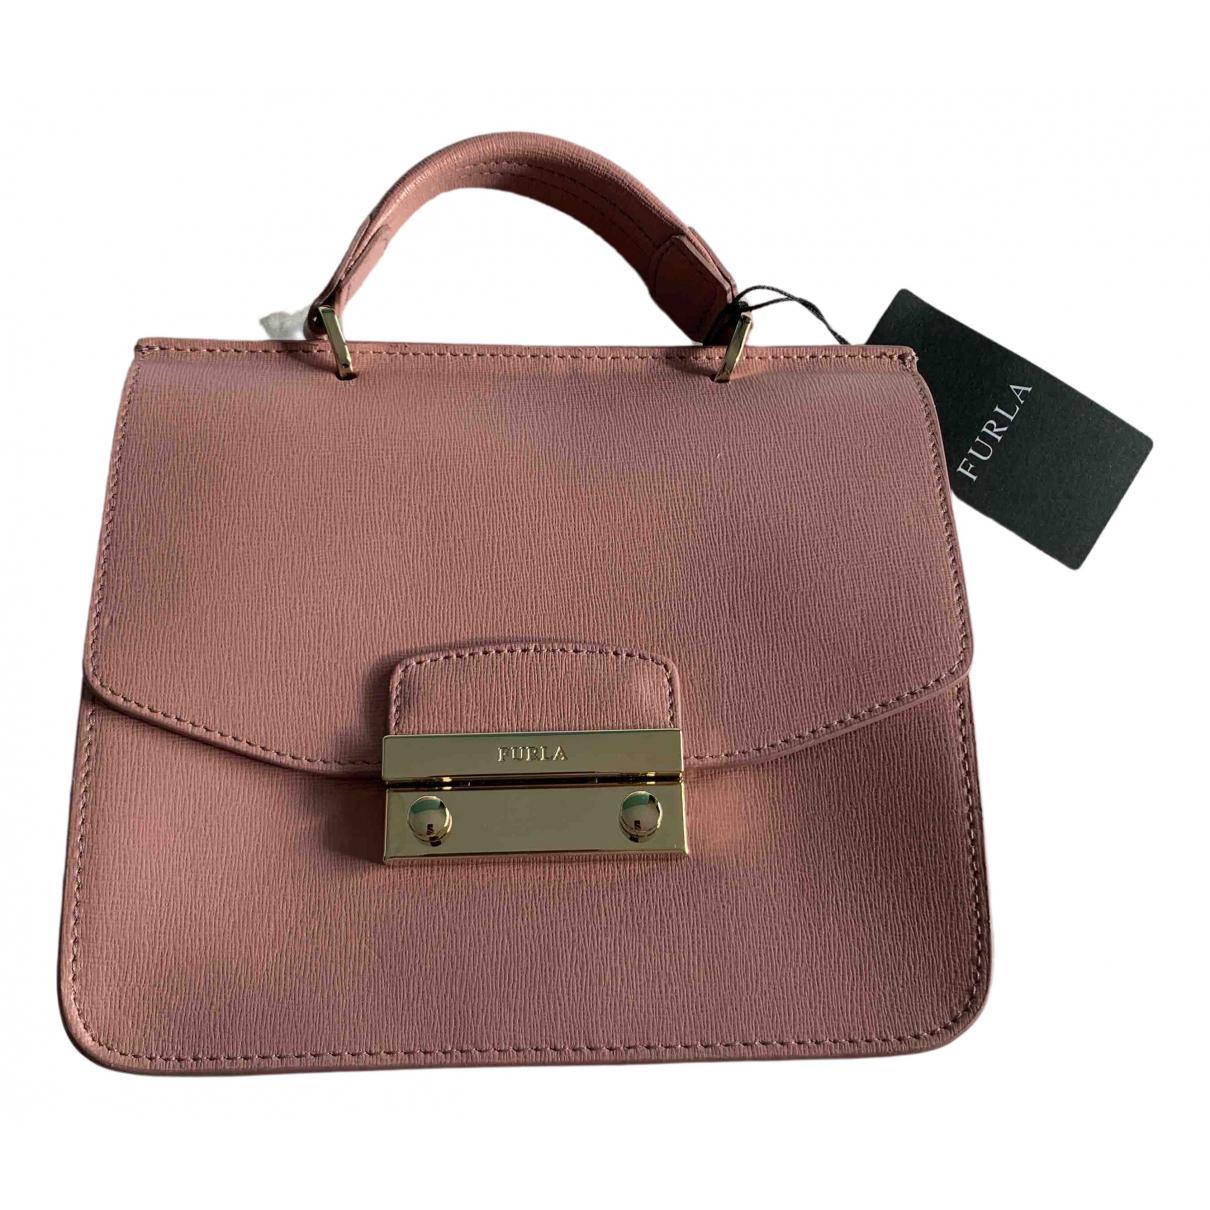 Furla N Pink Leather handbag for Women N